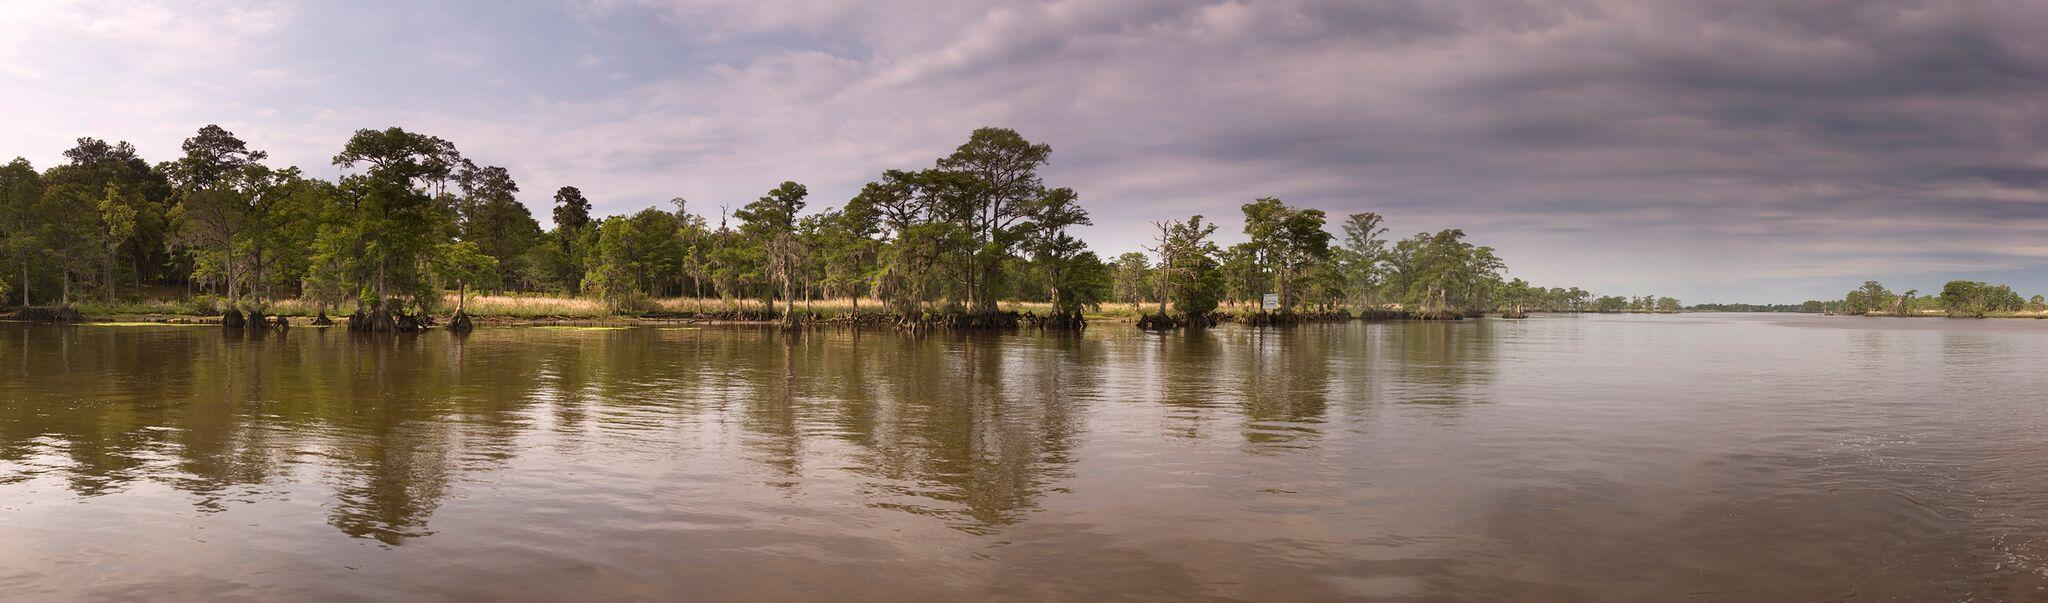 Pawleys Island #25543